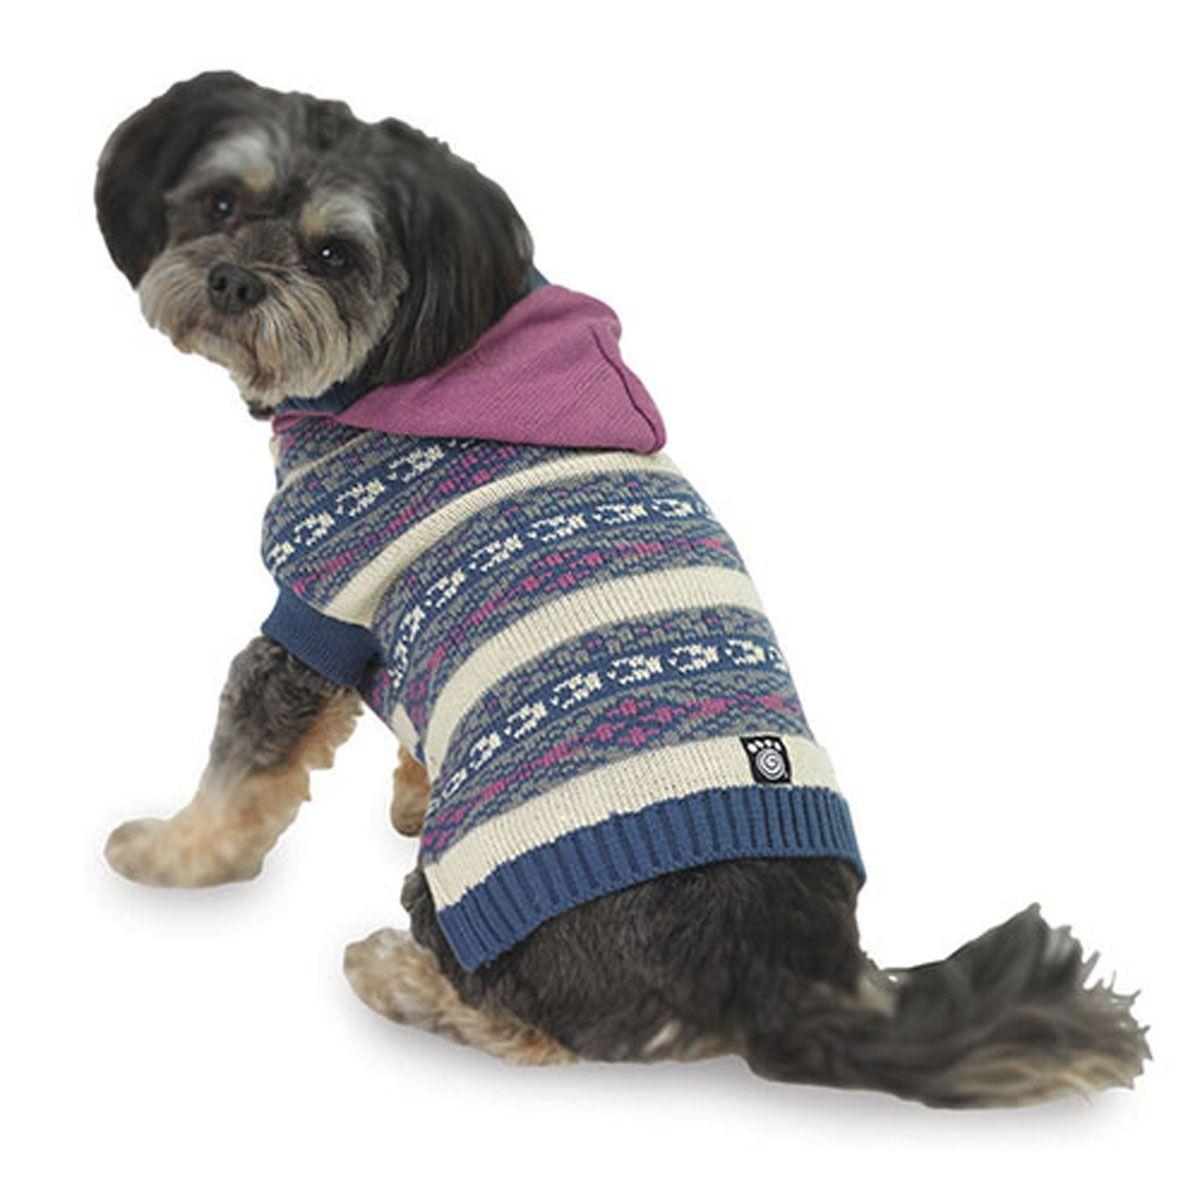 Phoebe's Hooded Fair Isle Dog Sweater - Purple | PUPS | Pinterest ...